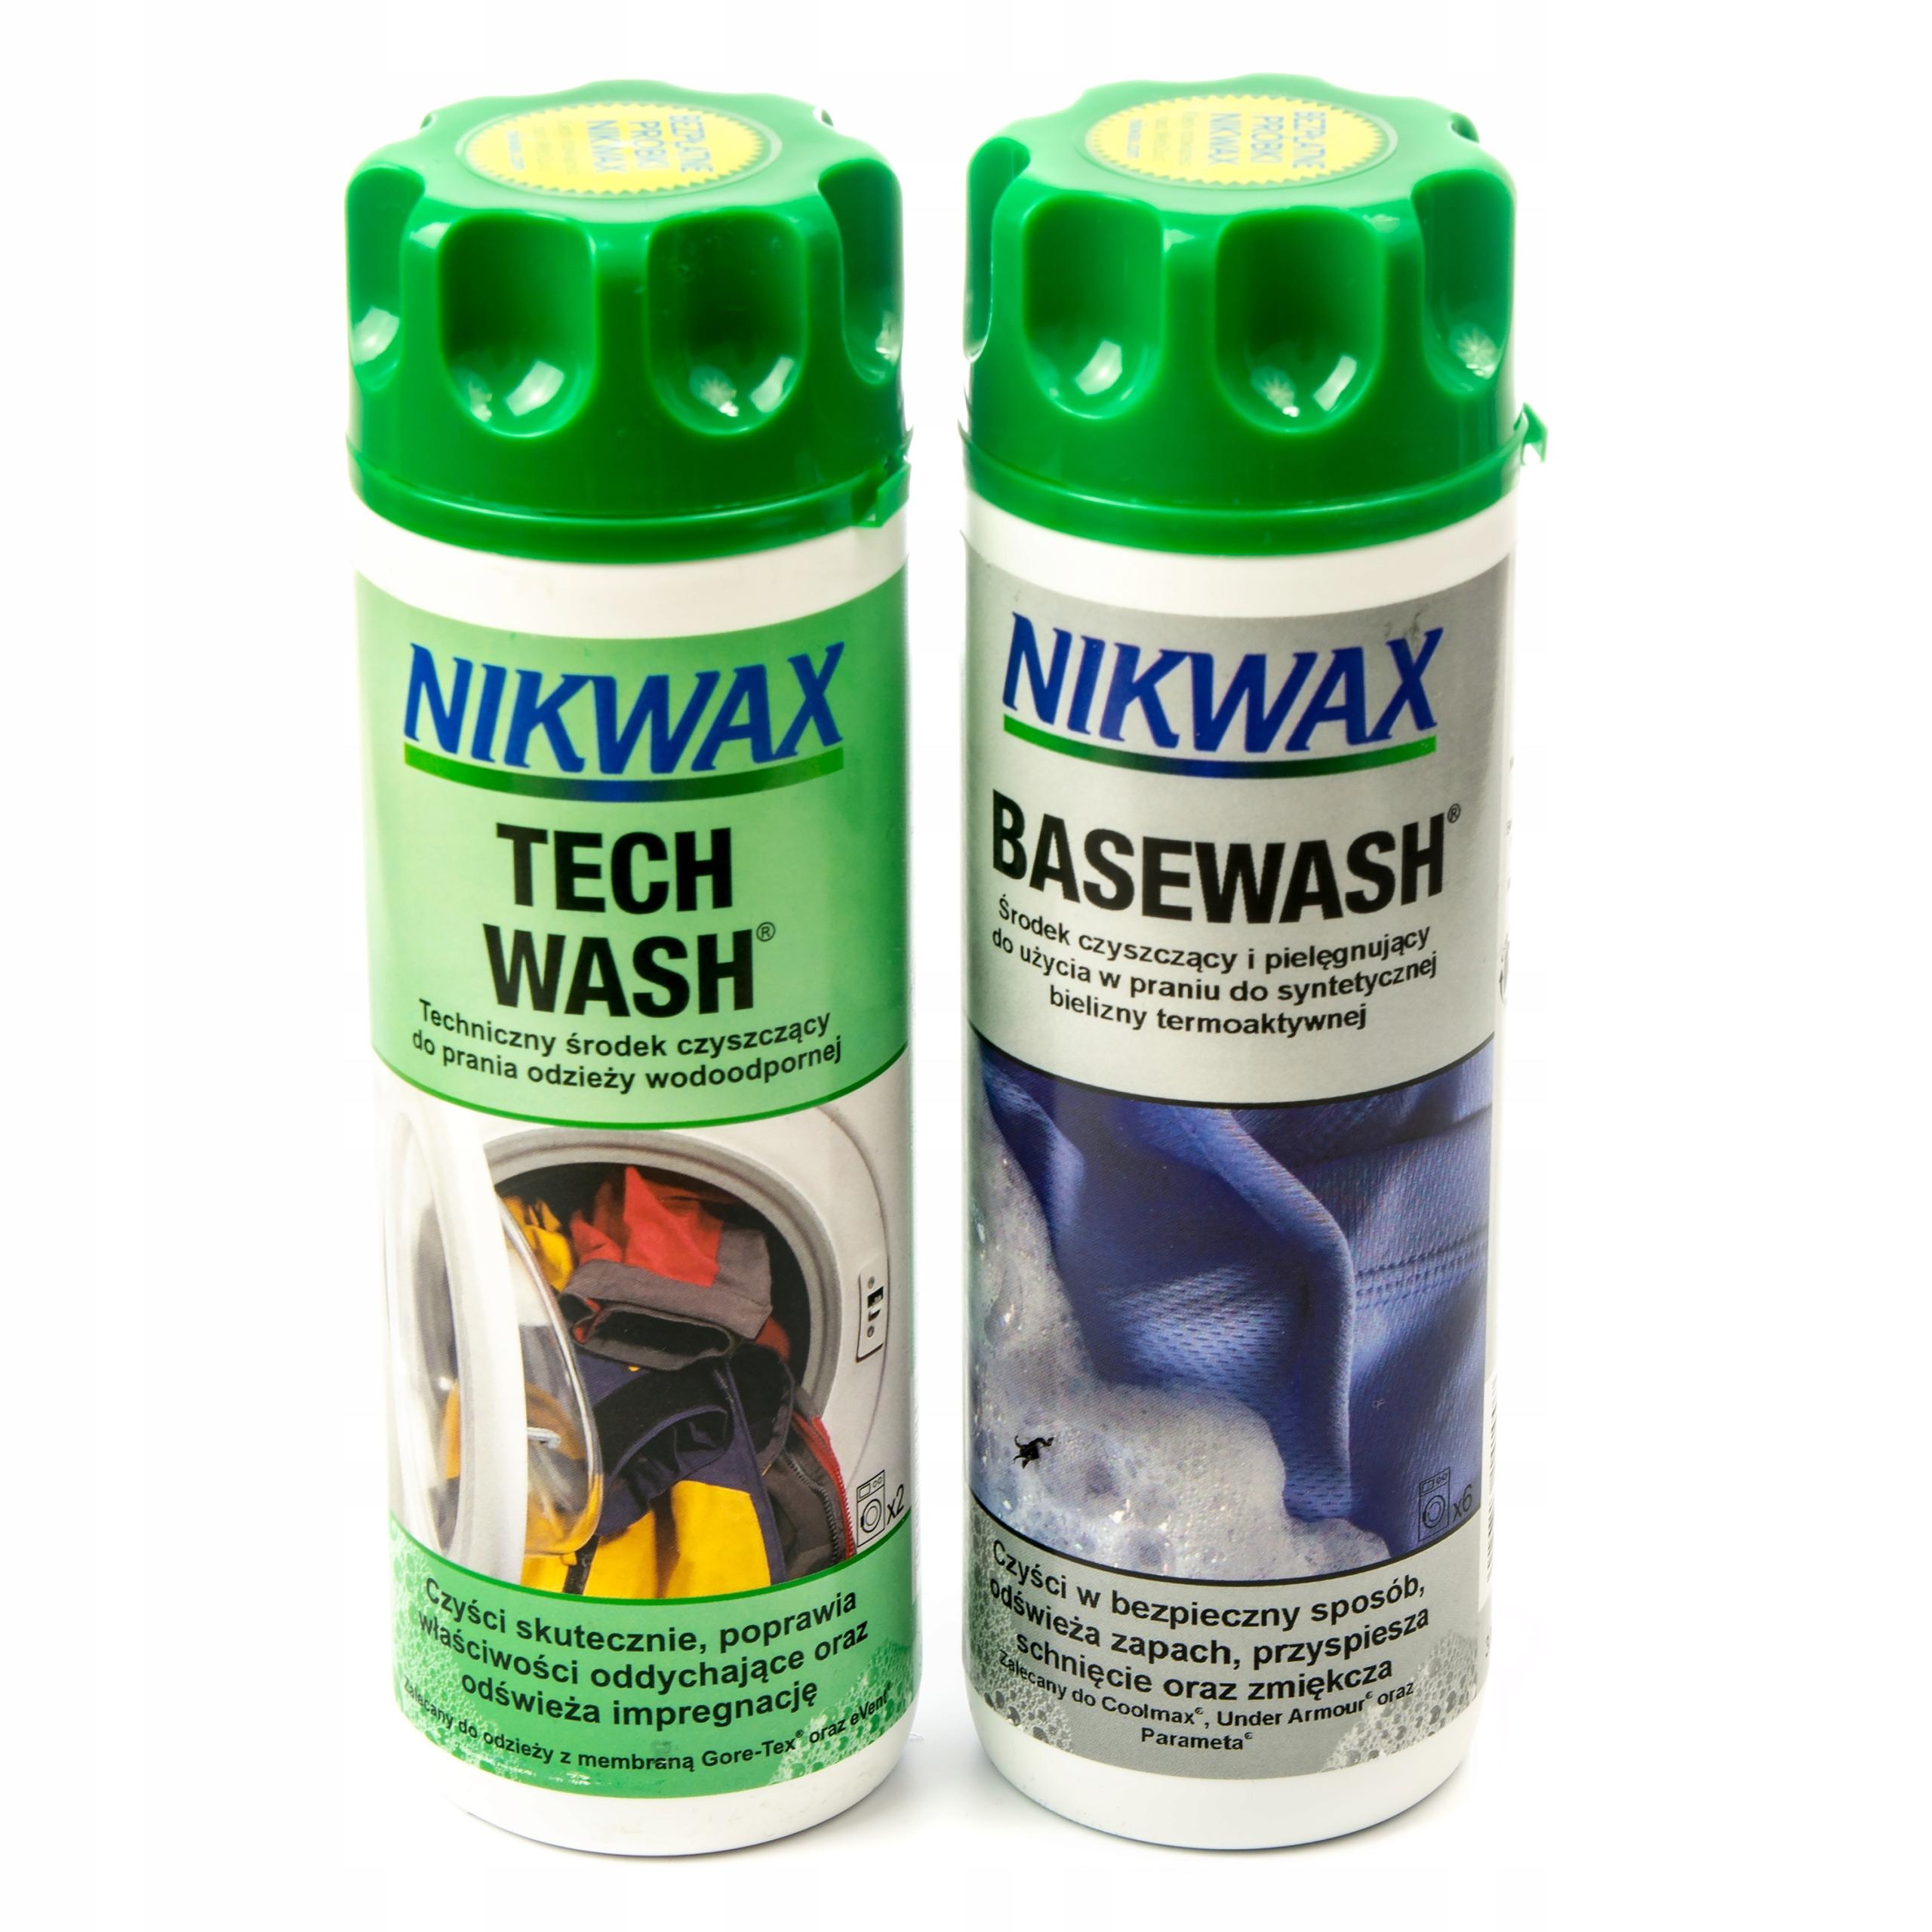 NIKWAX BASEWASH + TECHWASH - НАБОР ДЛЯ СТИРКИ TECH